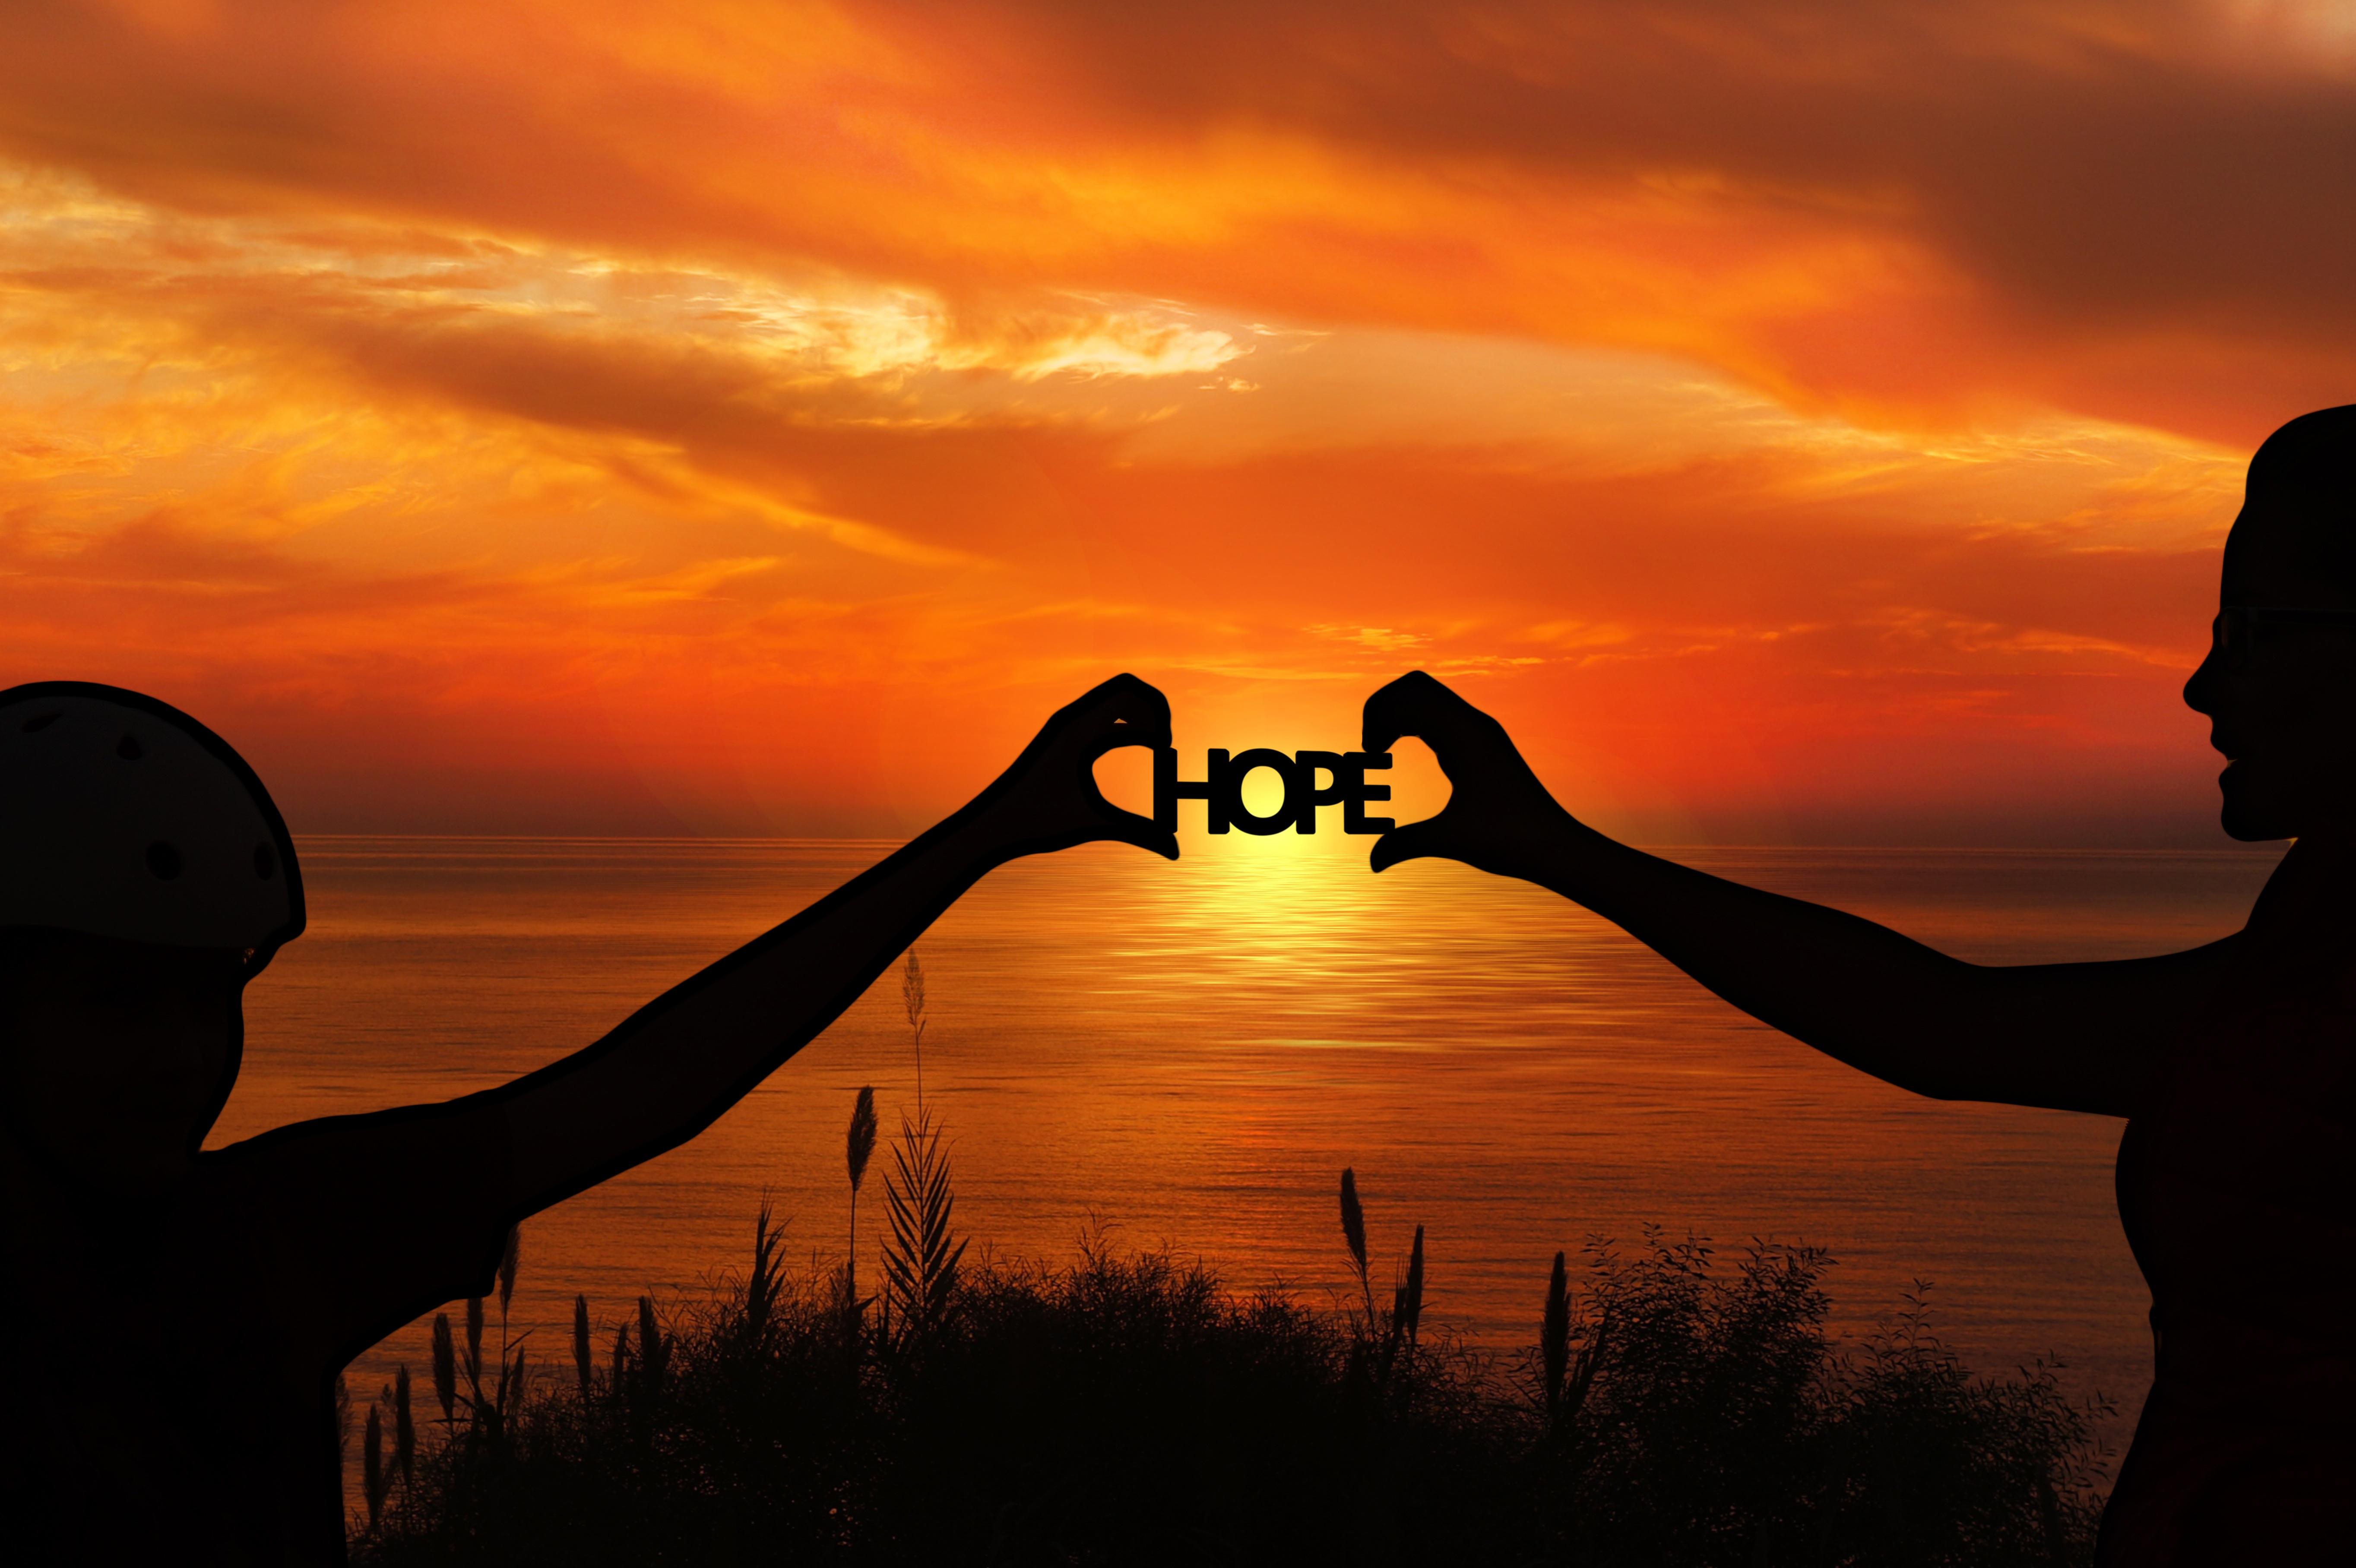 128677 скачать обои Слова, Надежда, Руки, Силуэты, Закат, Горизонт, Мотивация - заставки и картинки бесплатно